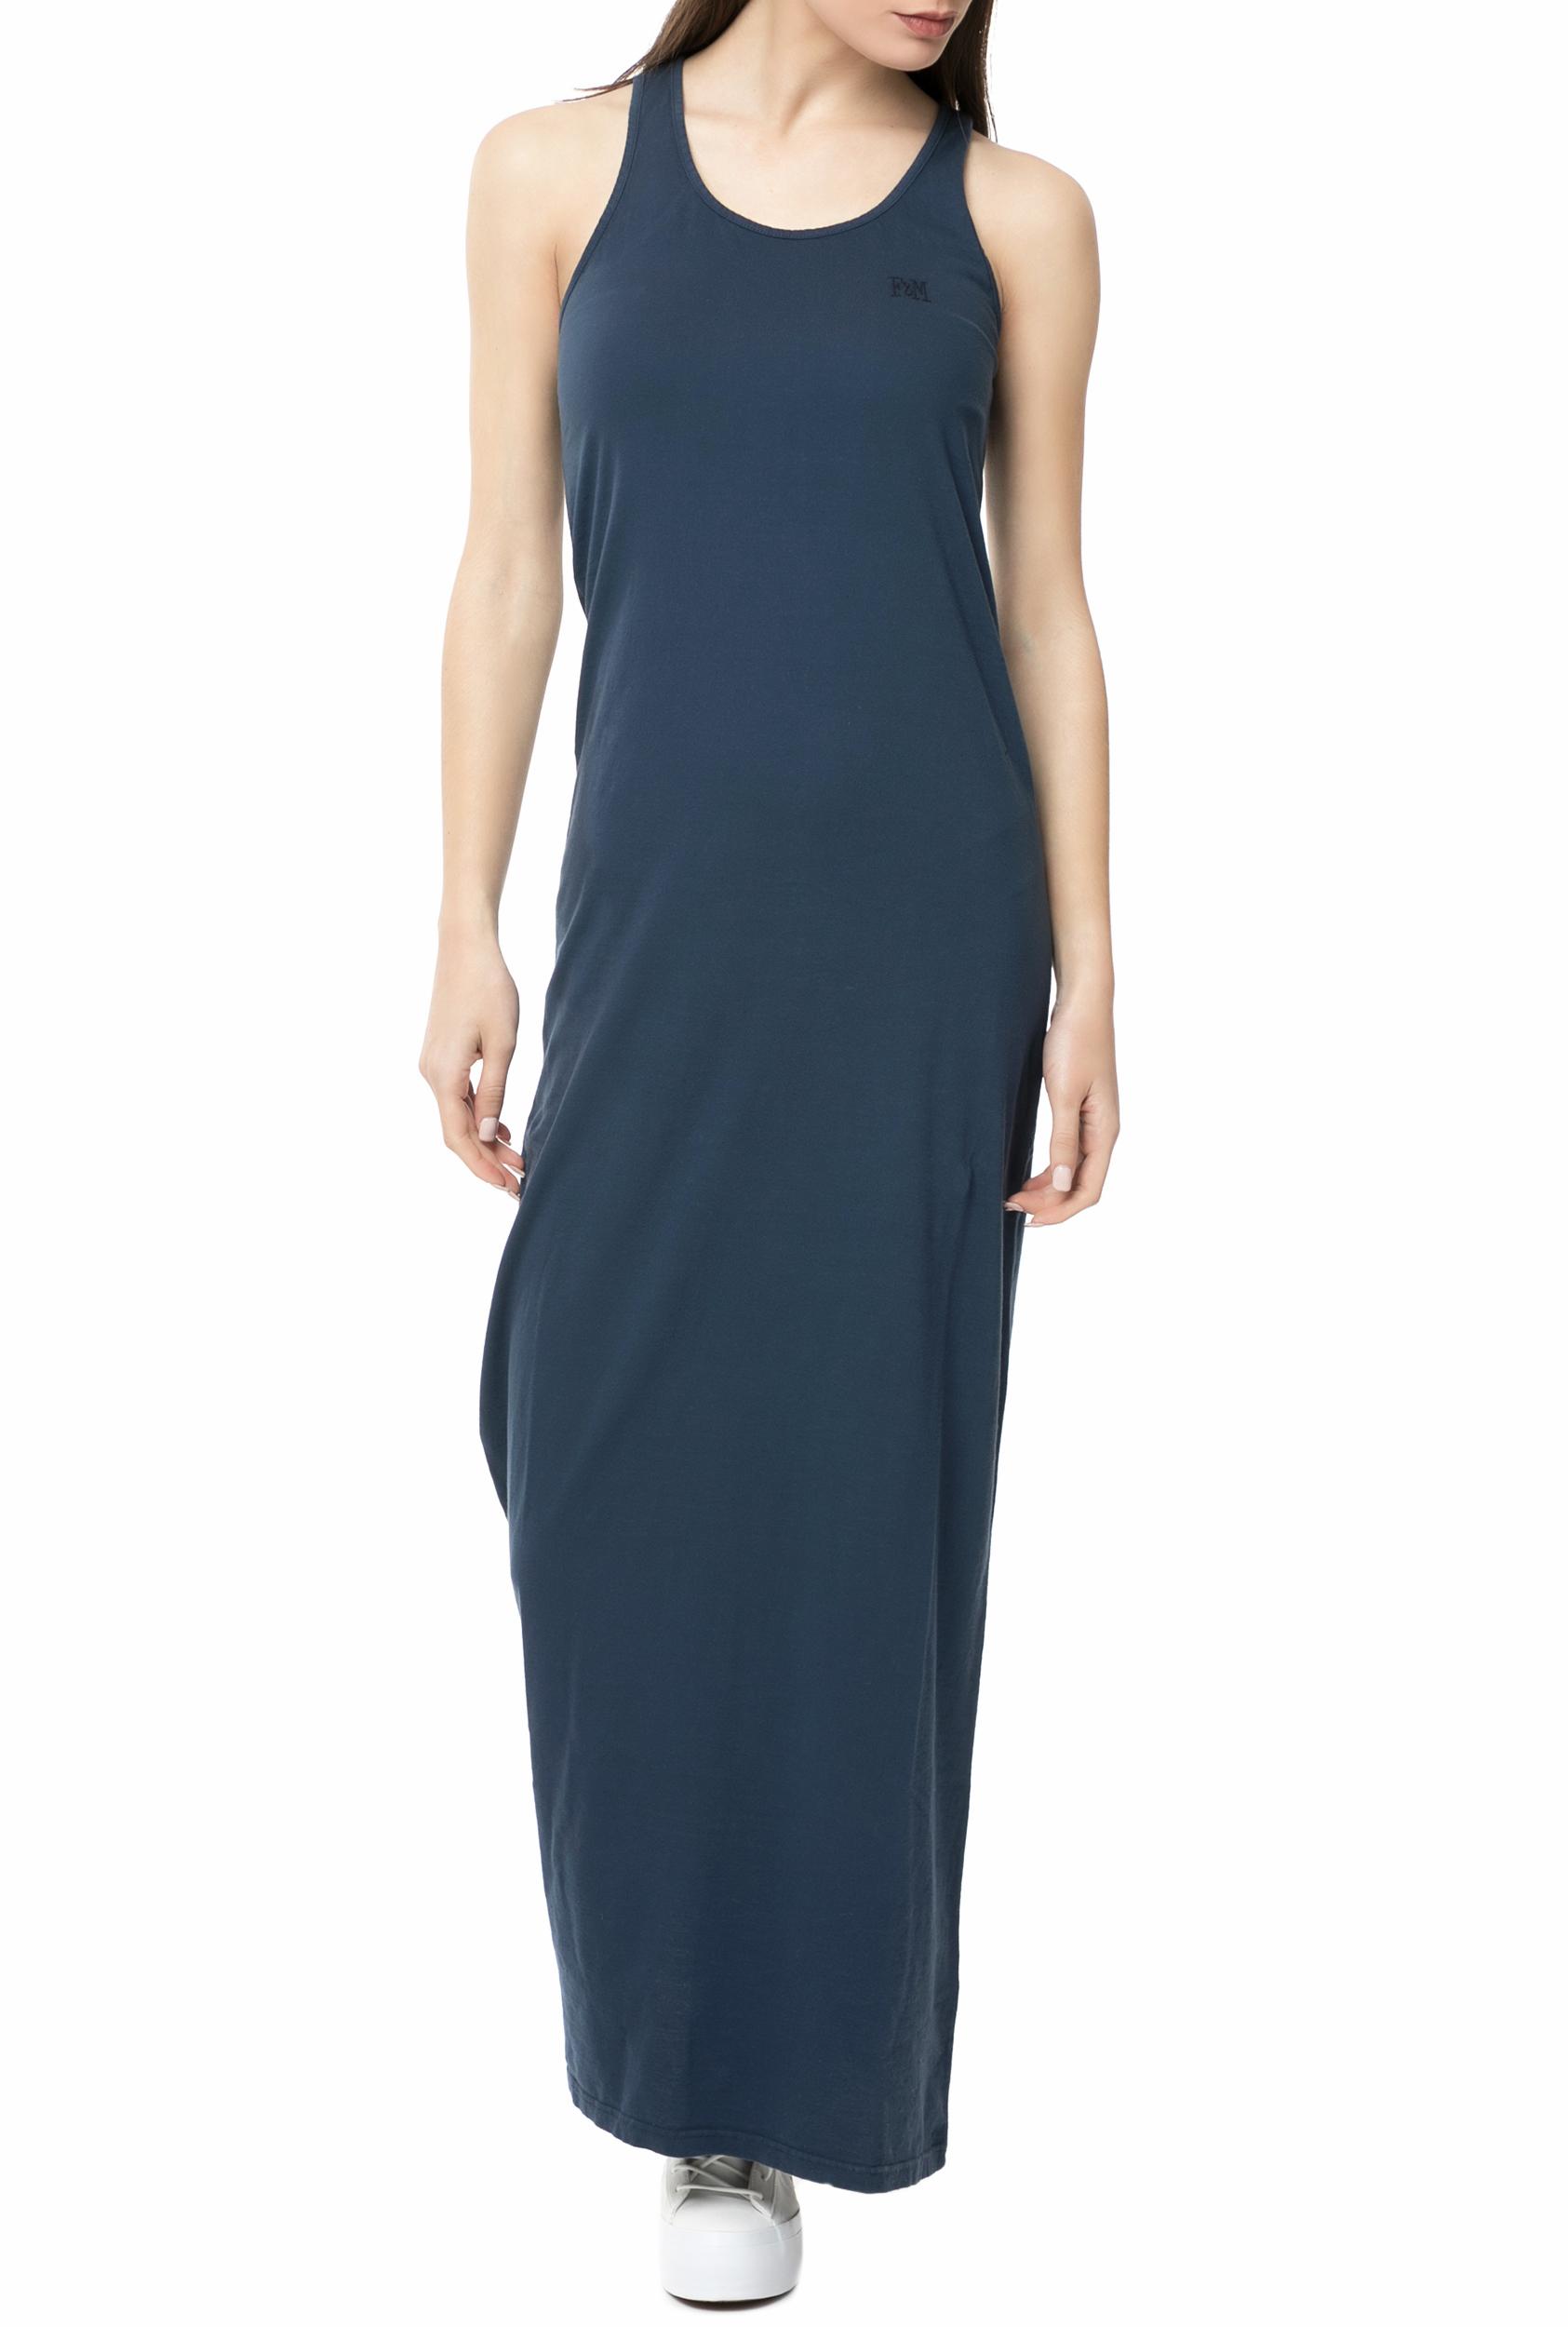 e7d8d347892 Κορυφαία προϊόντα για Ρούχα - Σελίδα 1821 | Outfit.gr